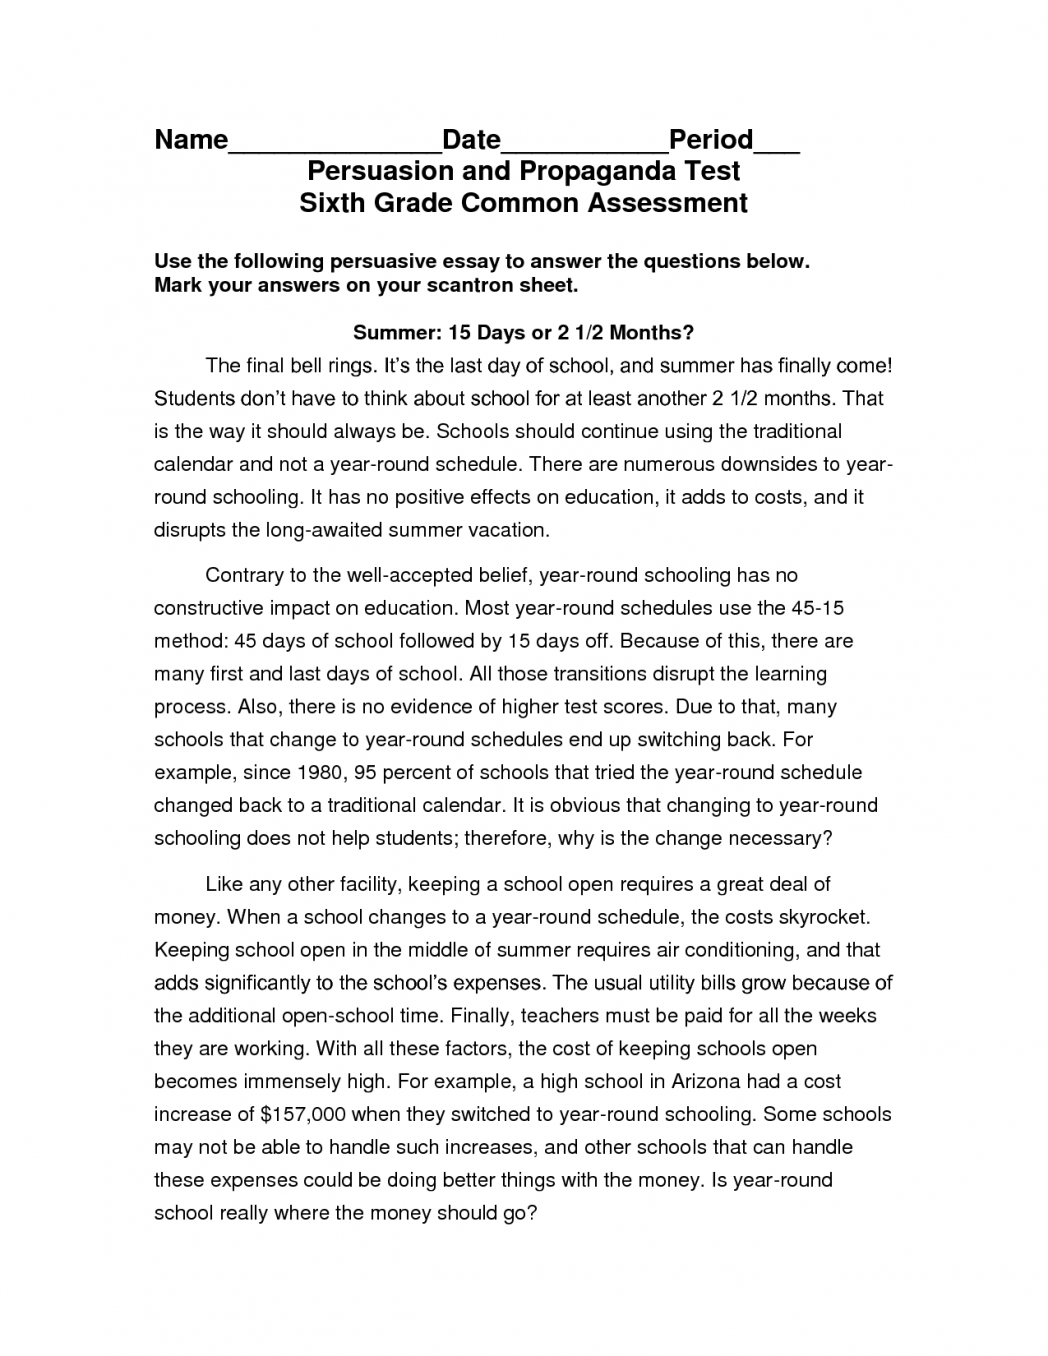 How to write an application essay 8th grade